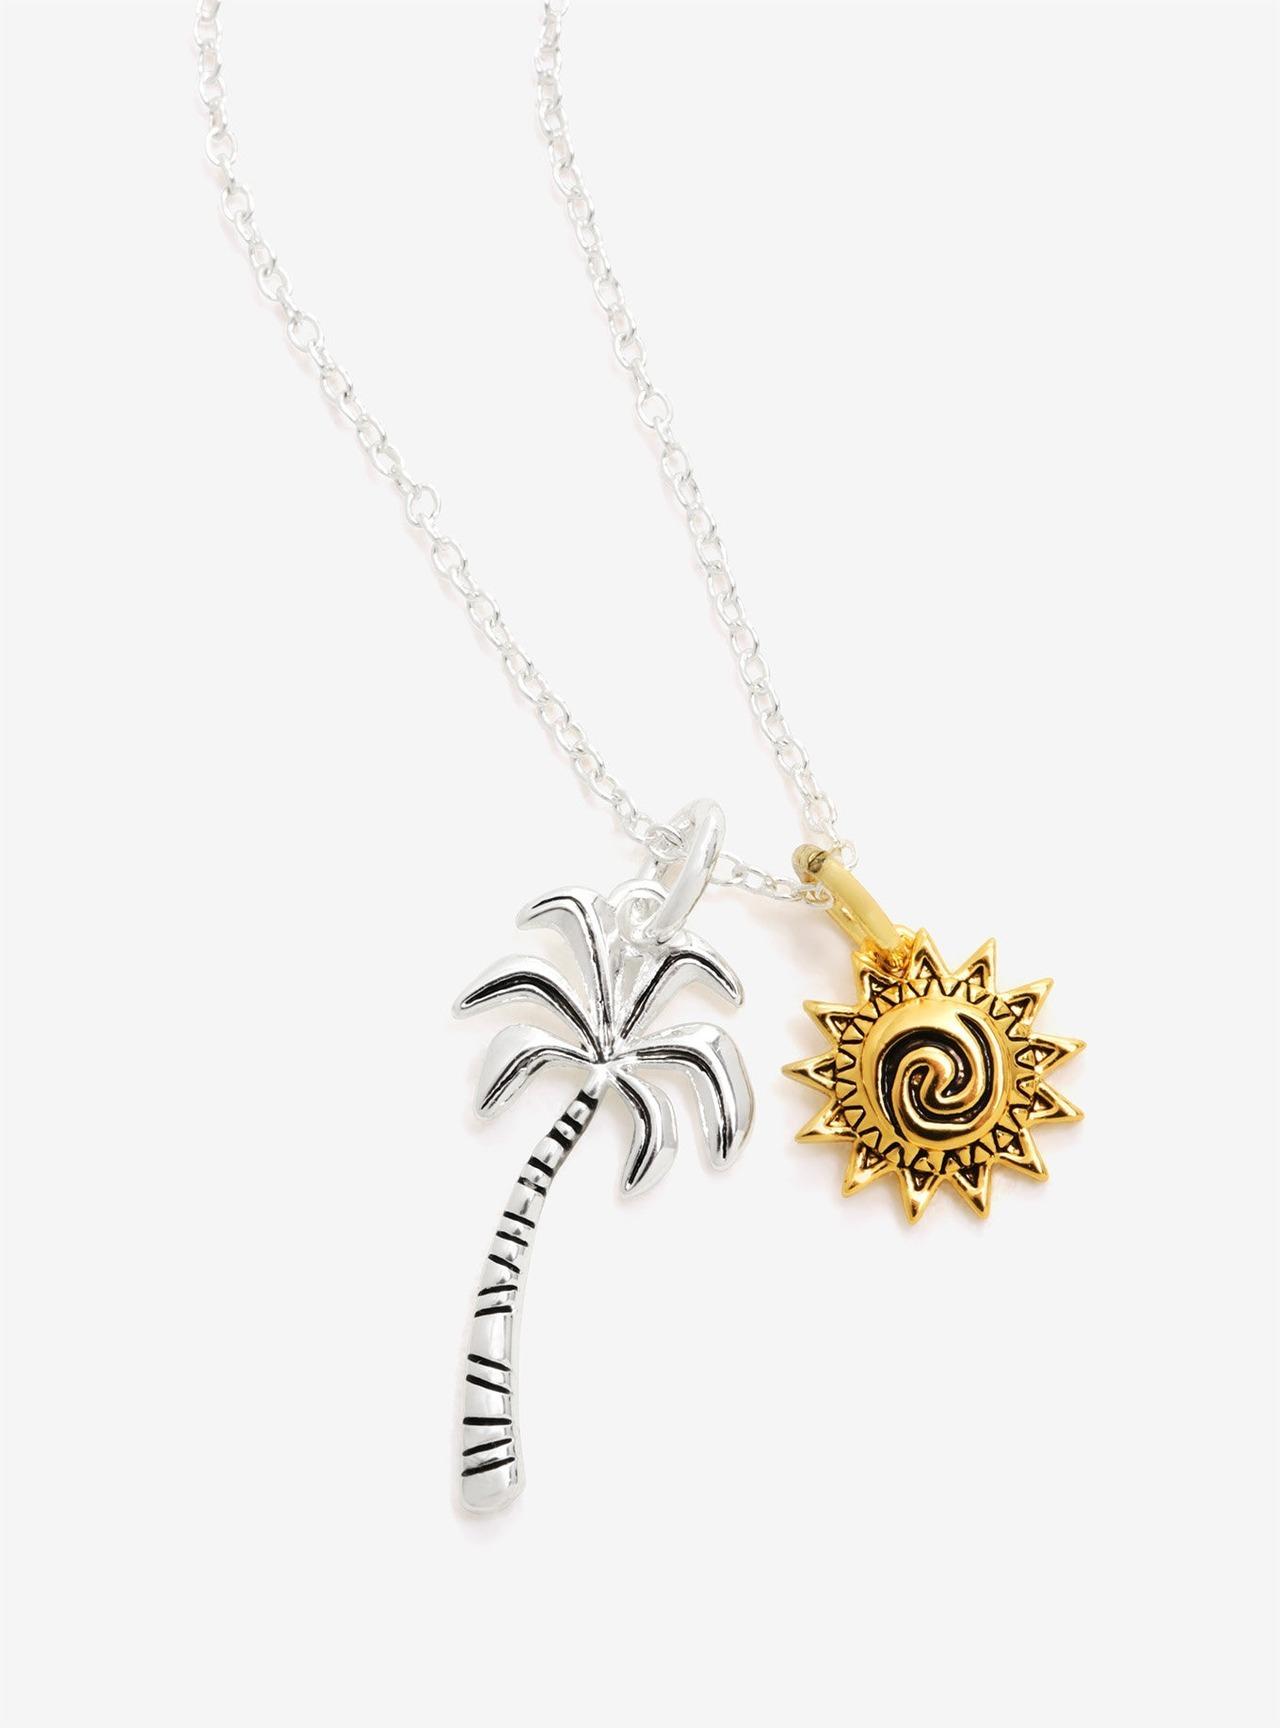 Jewelry & Accessories Modest Fashion Galaxy Pattern Bangle Asteroid Jewelry Petite Solar System Planet Adjustable Bracelet Mars Planet Mercury Jewelry Gift Bangles